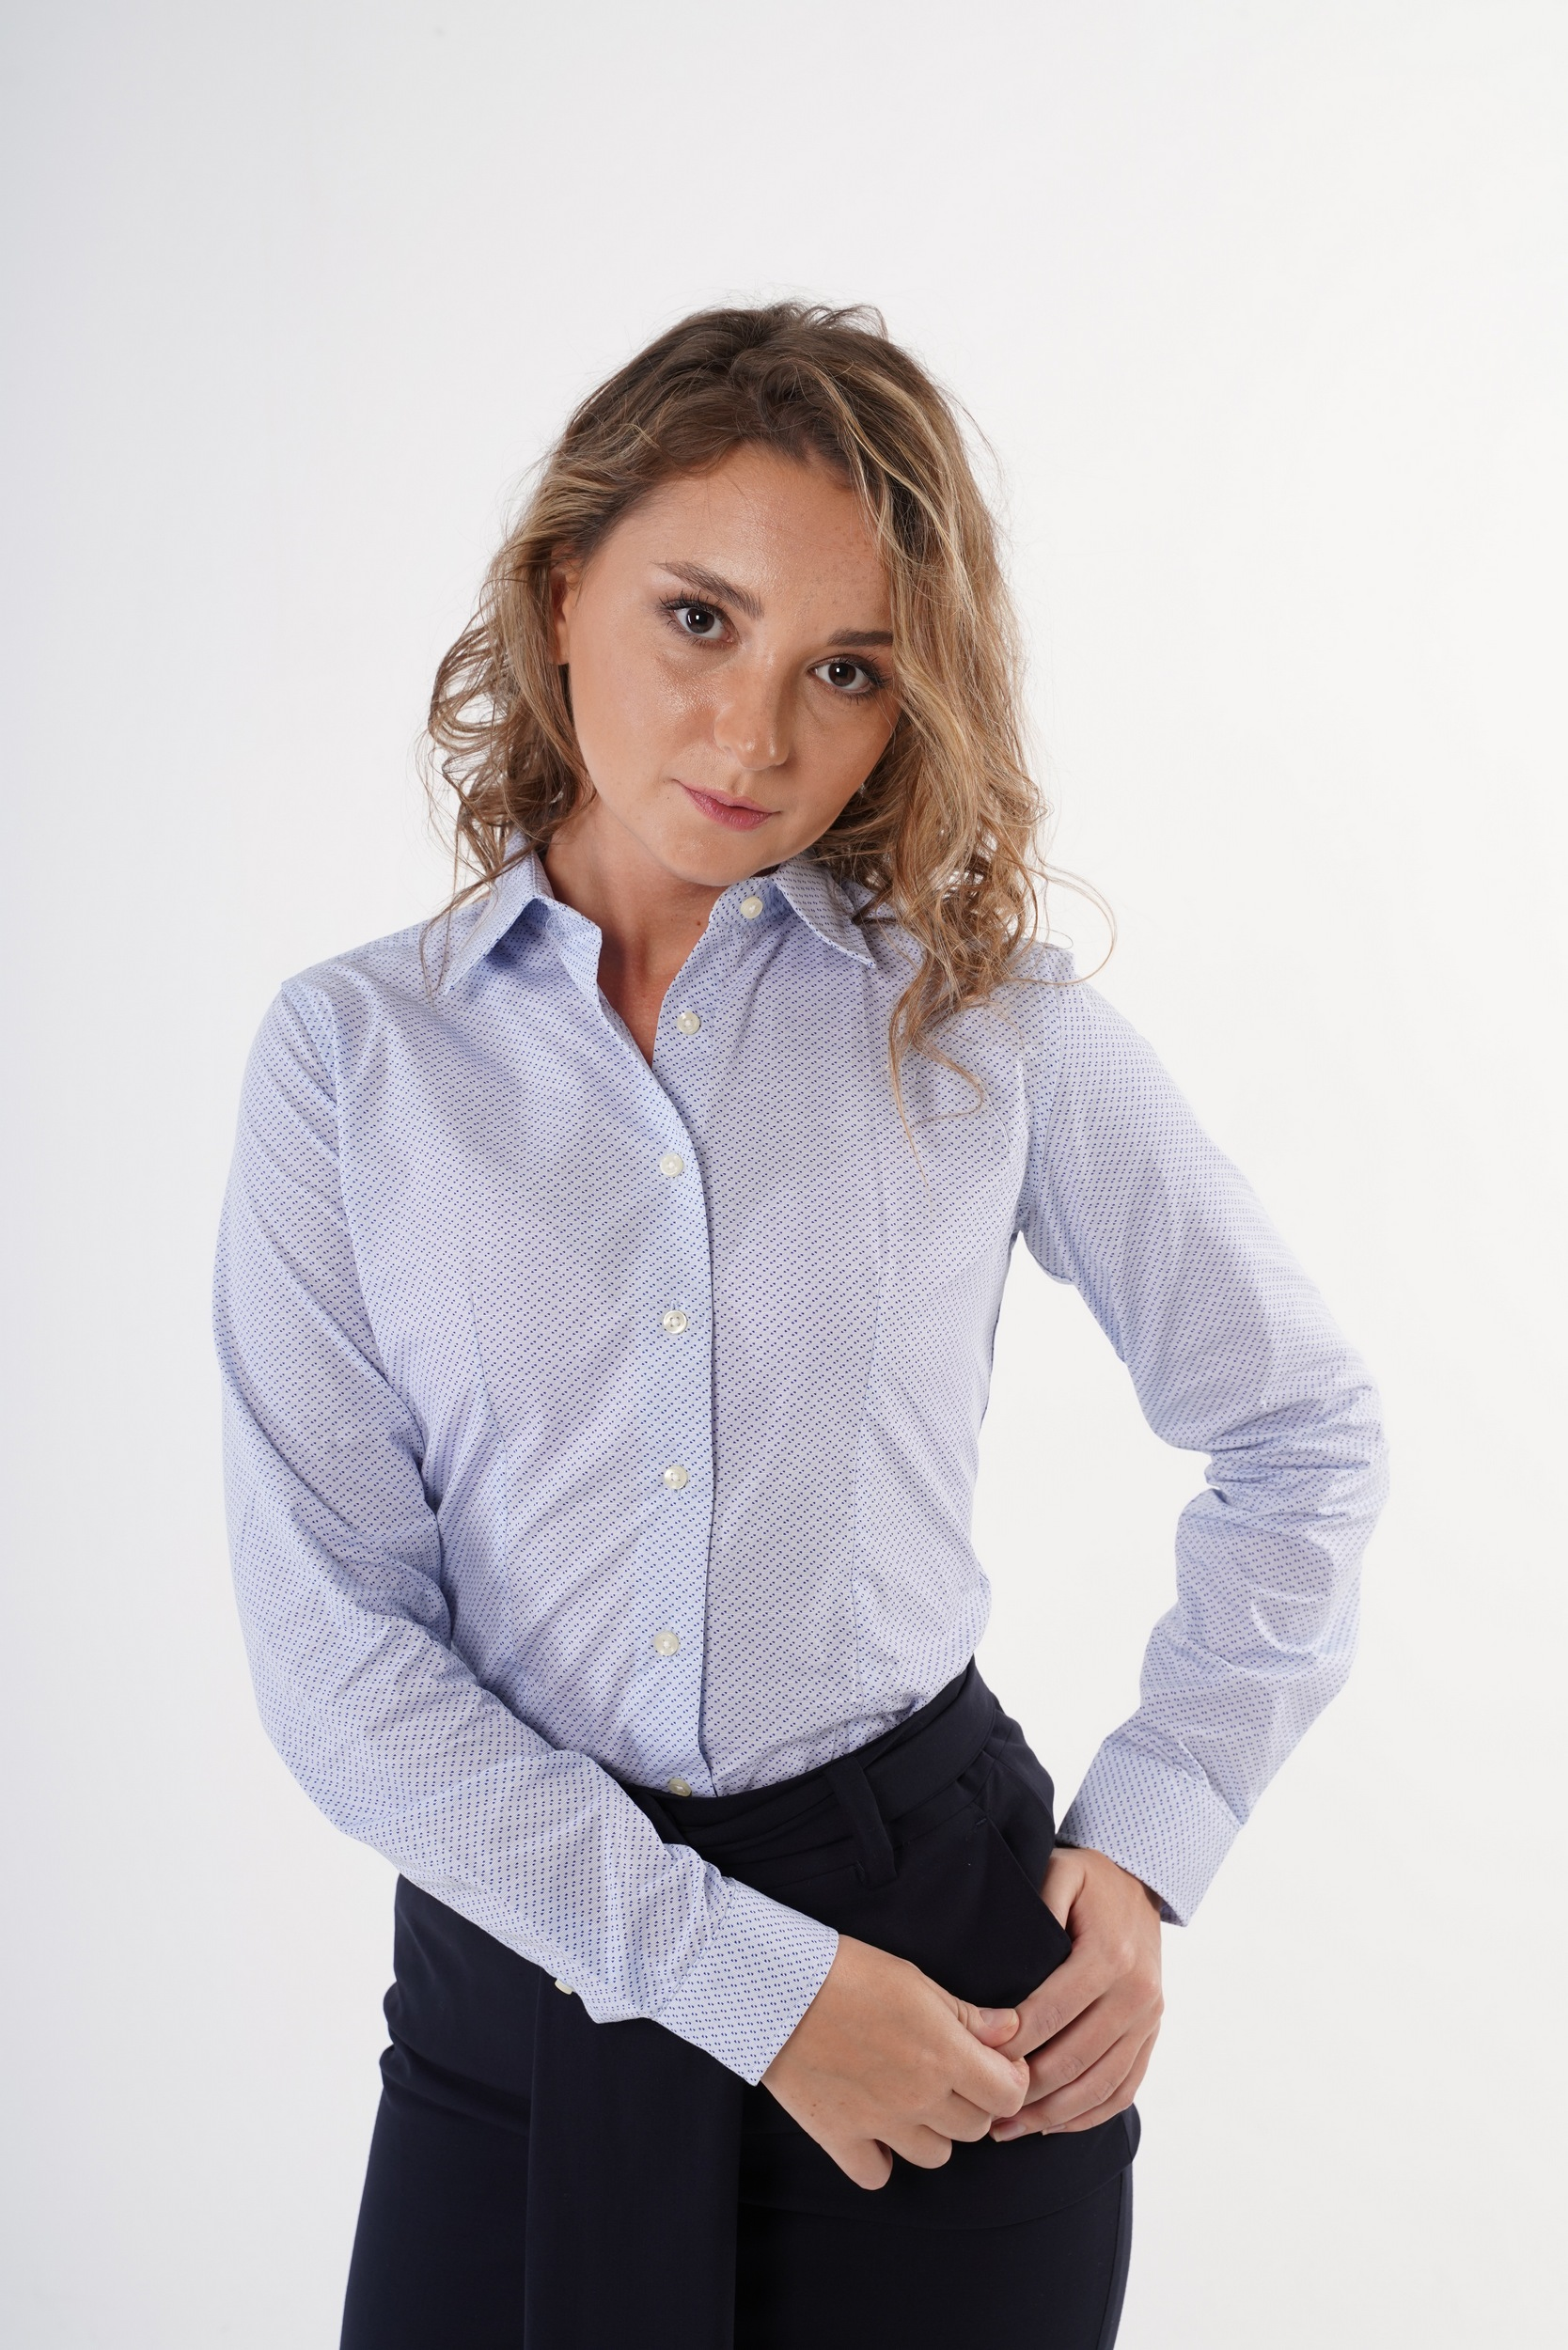 Camisa Azul Claro Formal Mulher